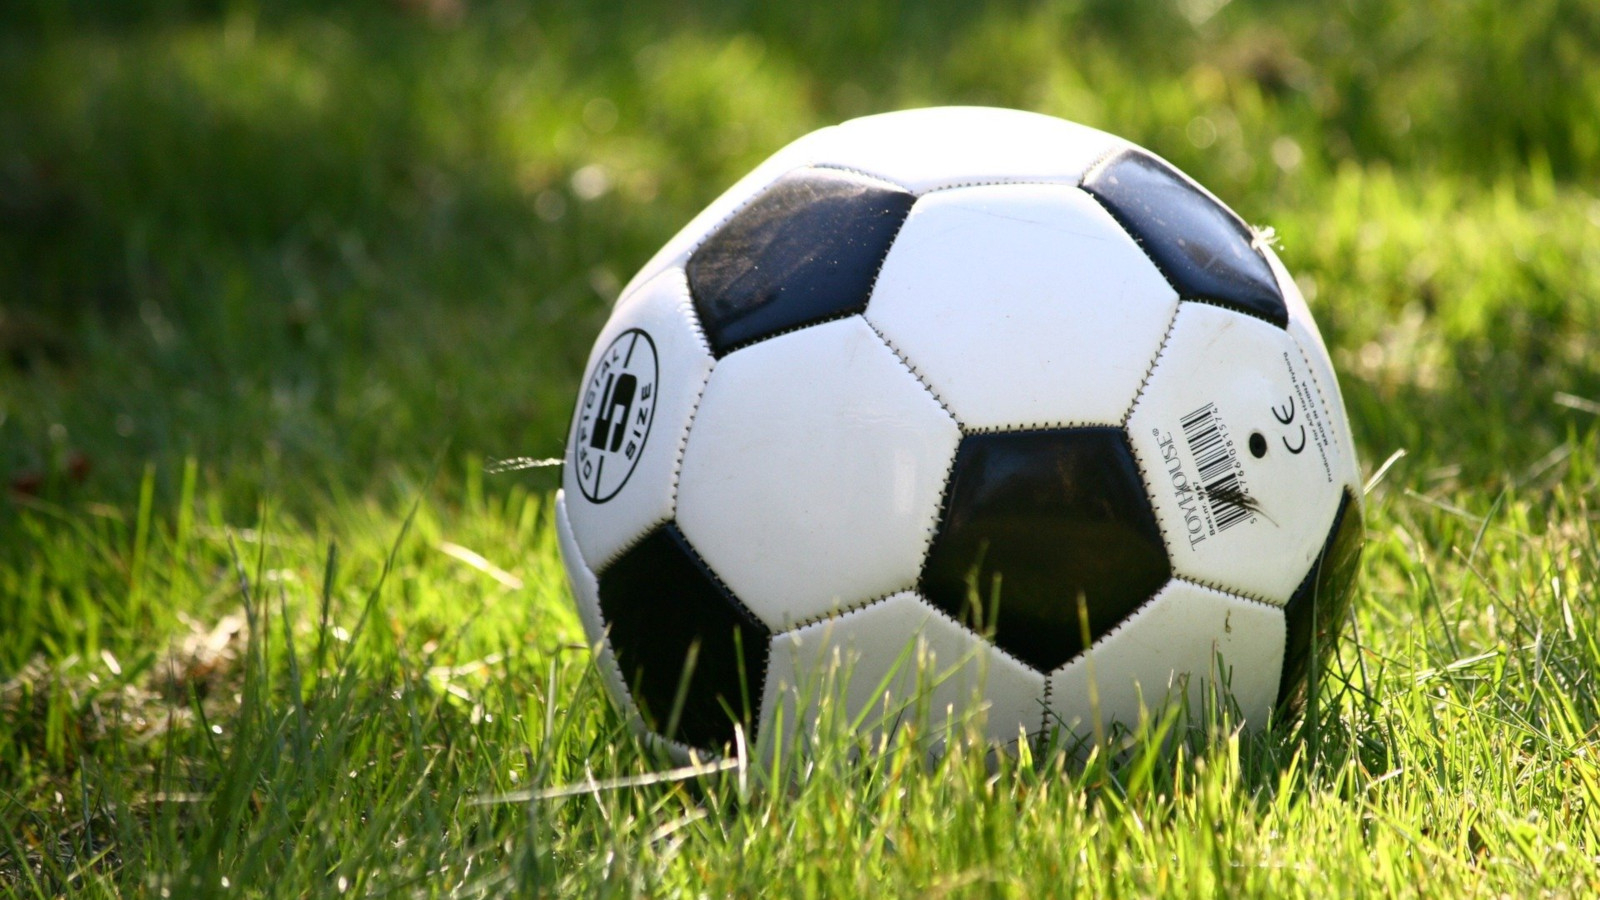 © Football : Clermont Foot 63 - En Avant Guingamp